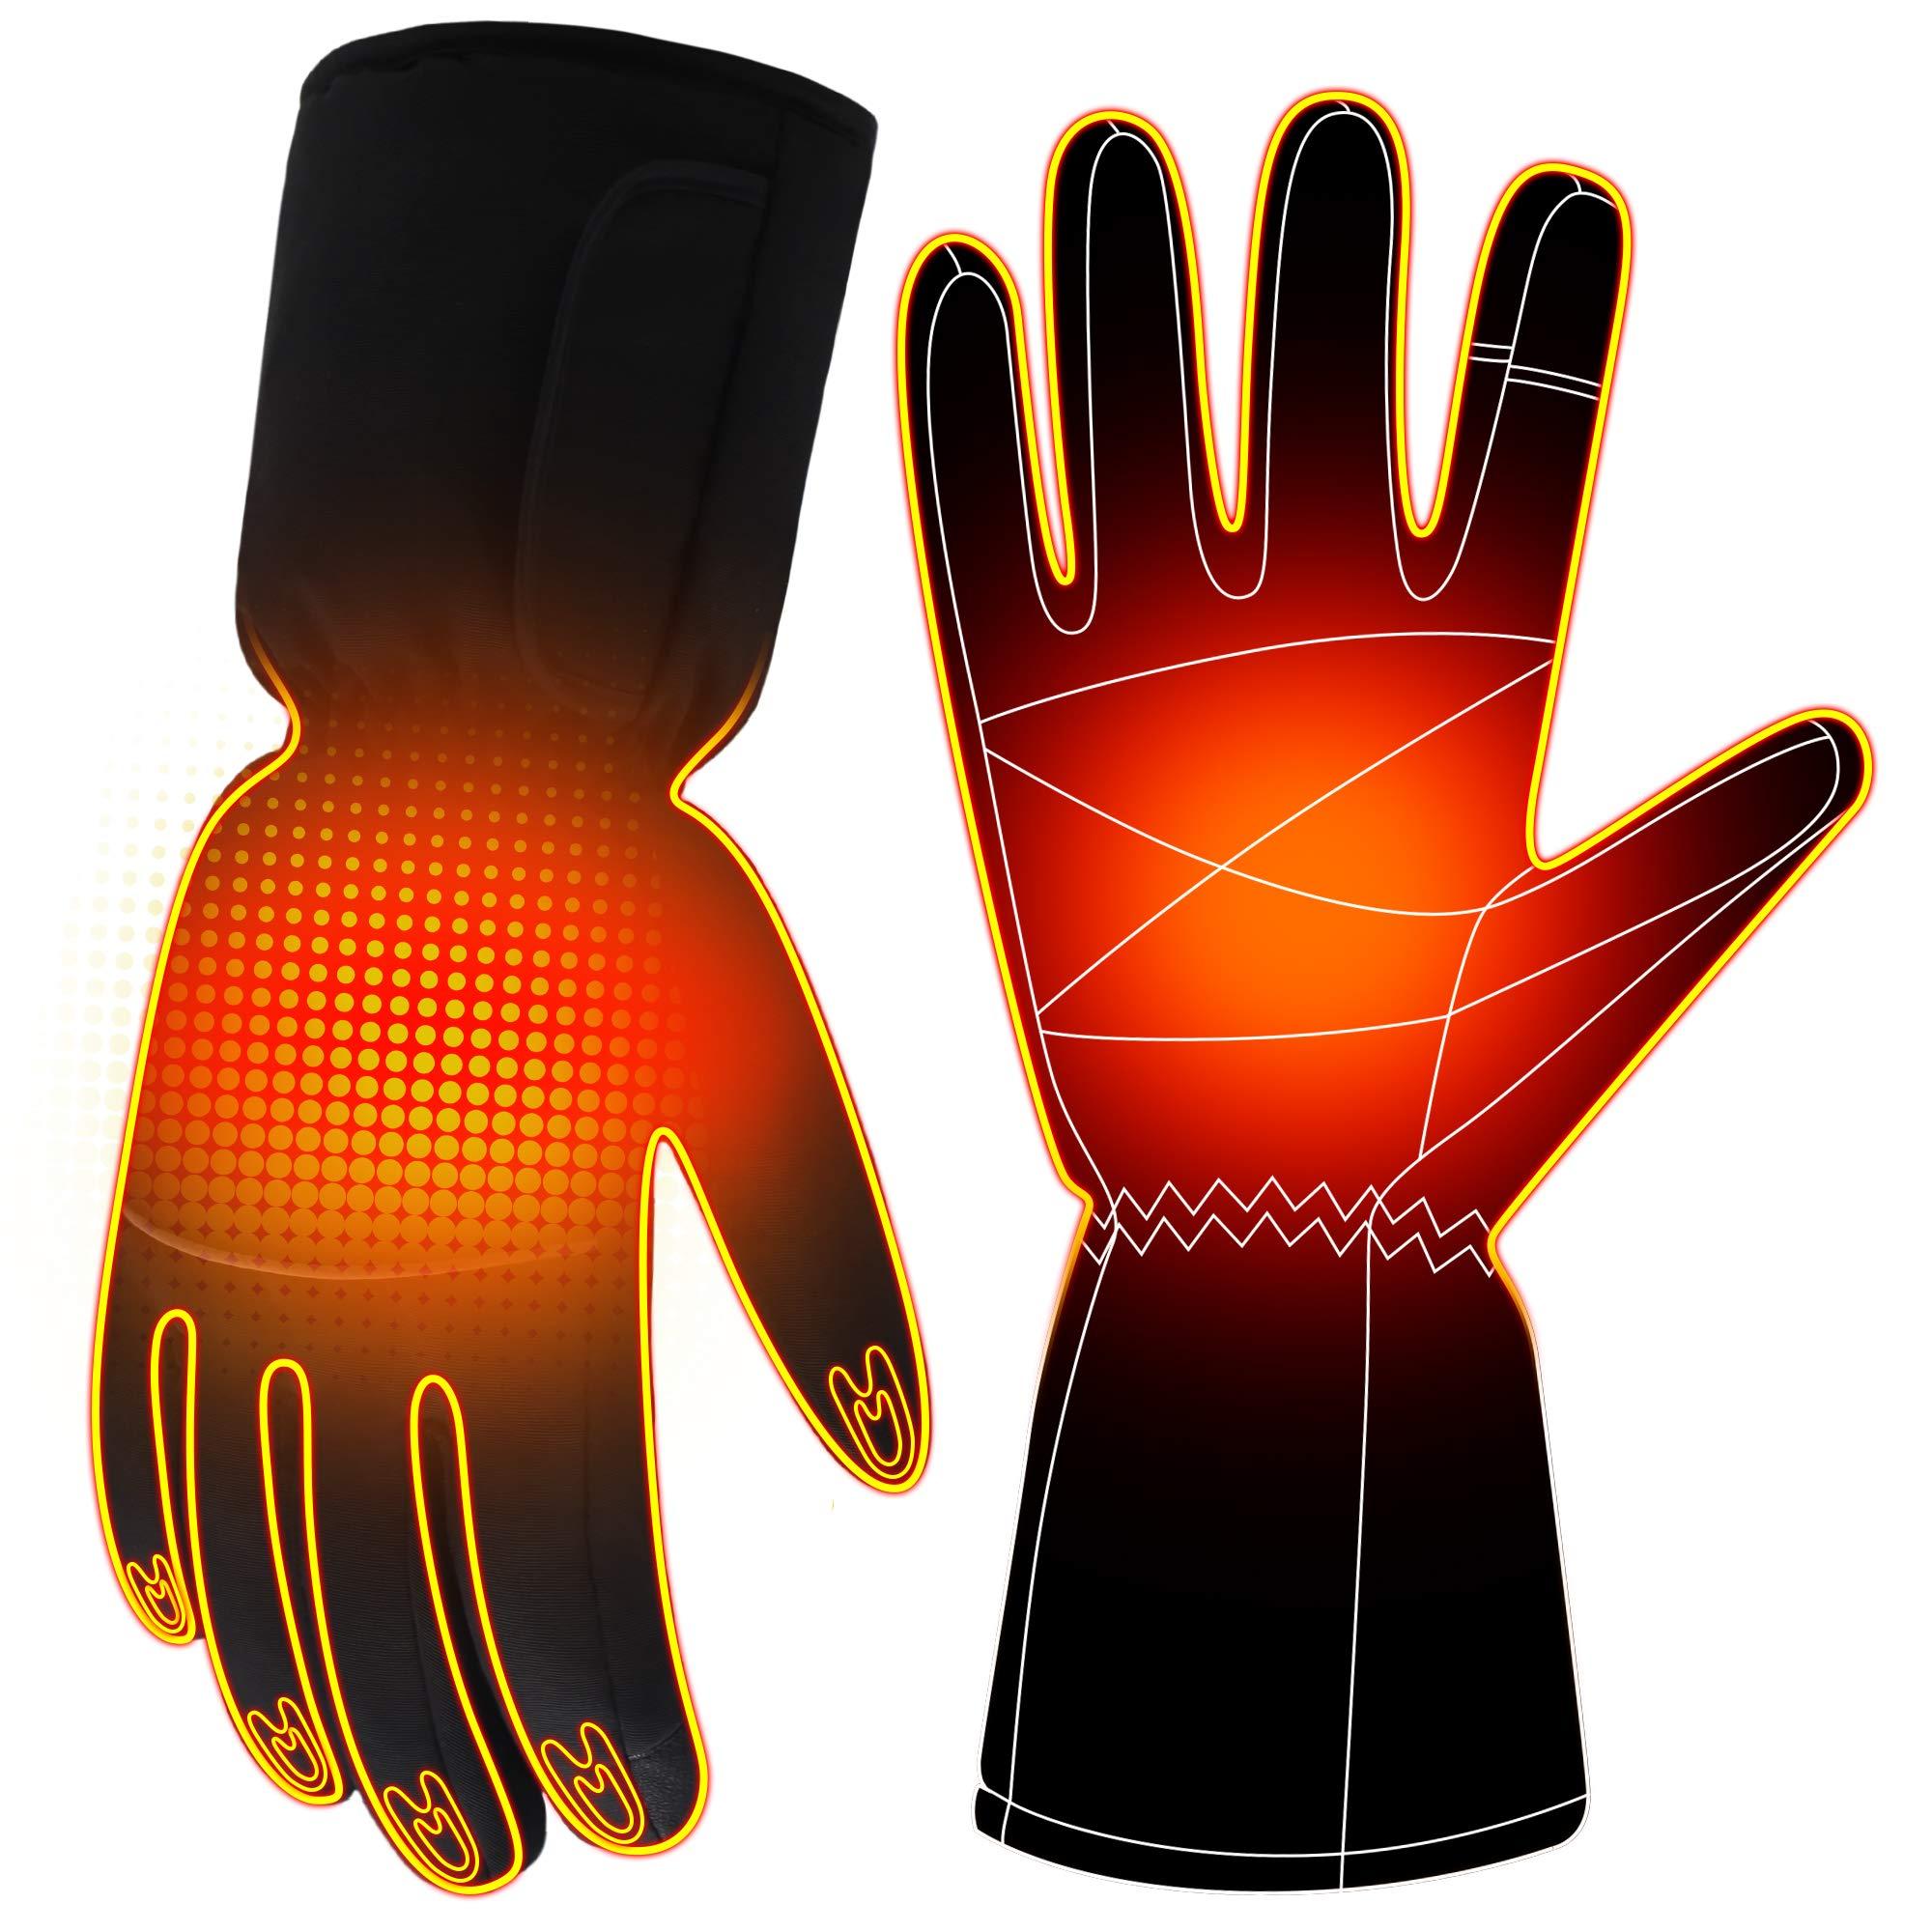 Heated Gloves Rechargeable Battery Heat Gloves Kit Winter Hand Warmer,3 Heat